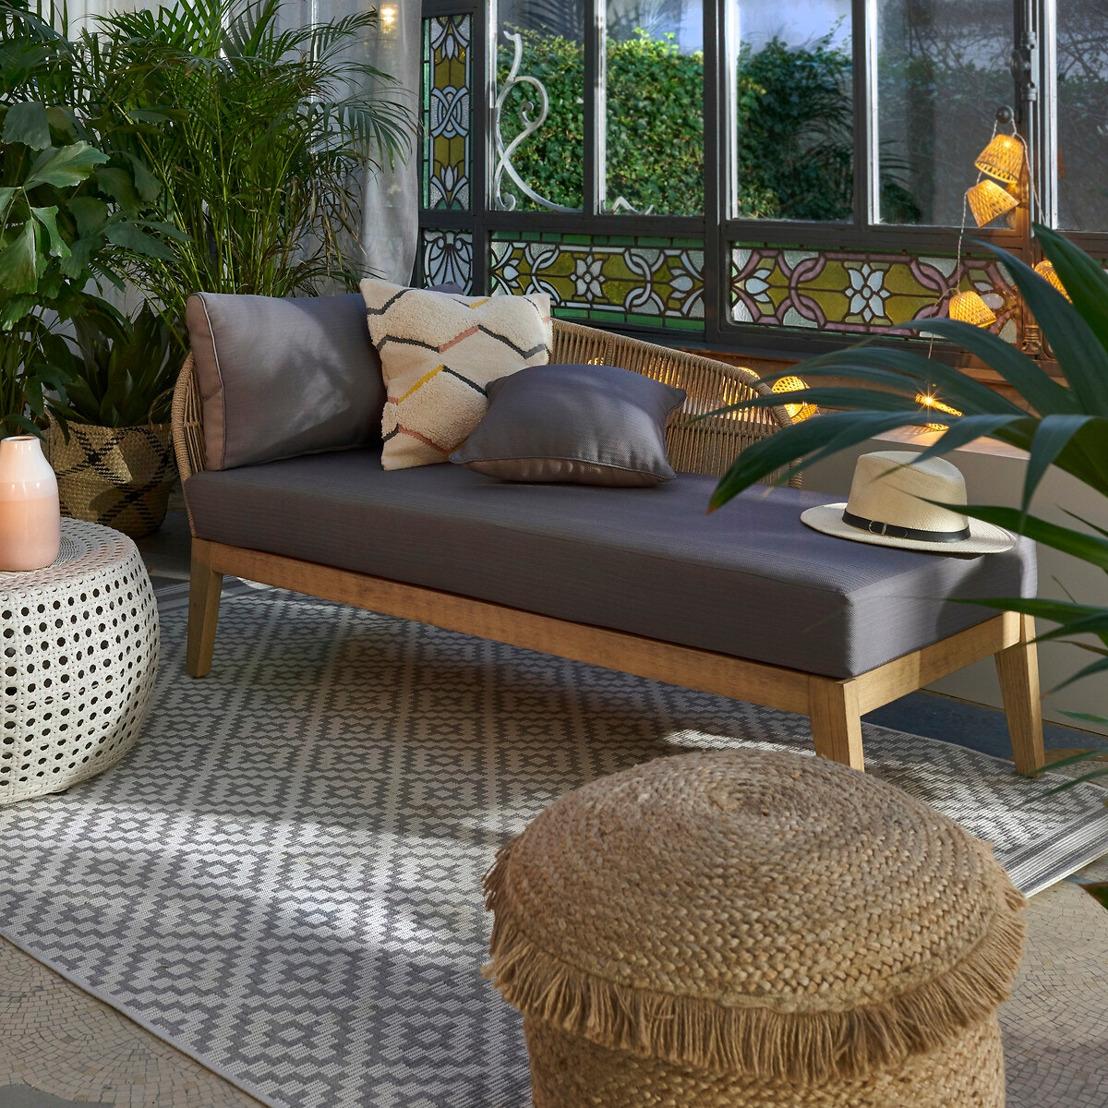 La Redoute garden 2021